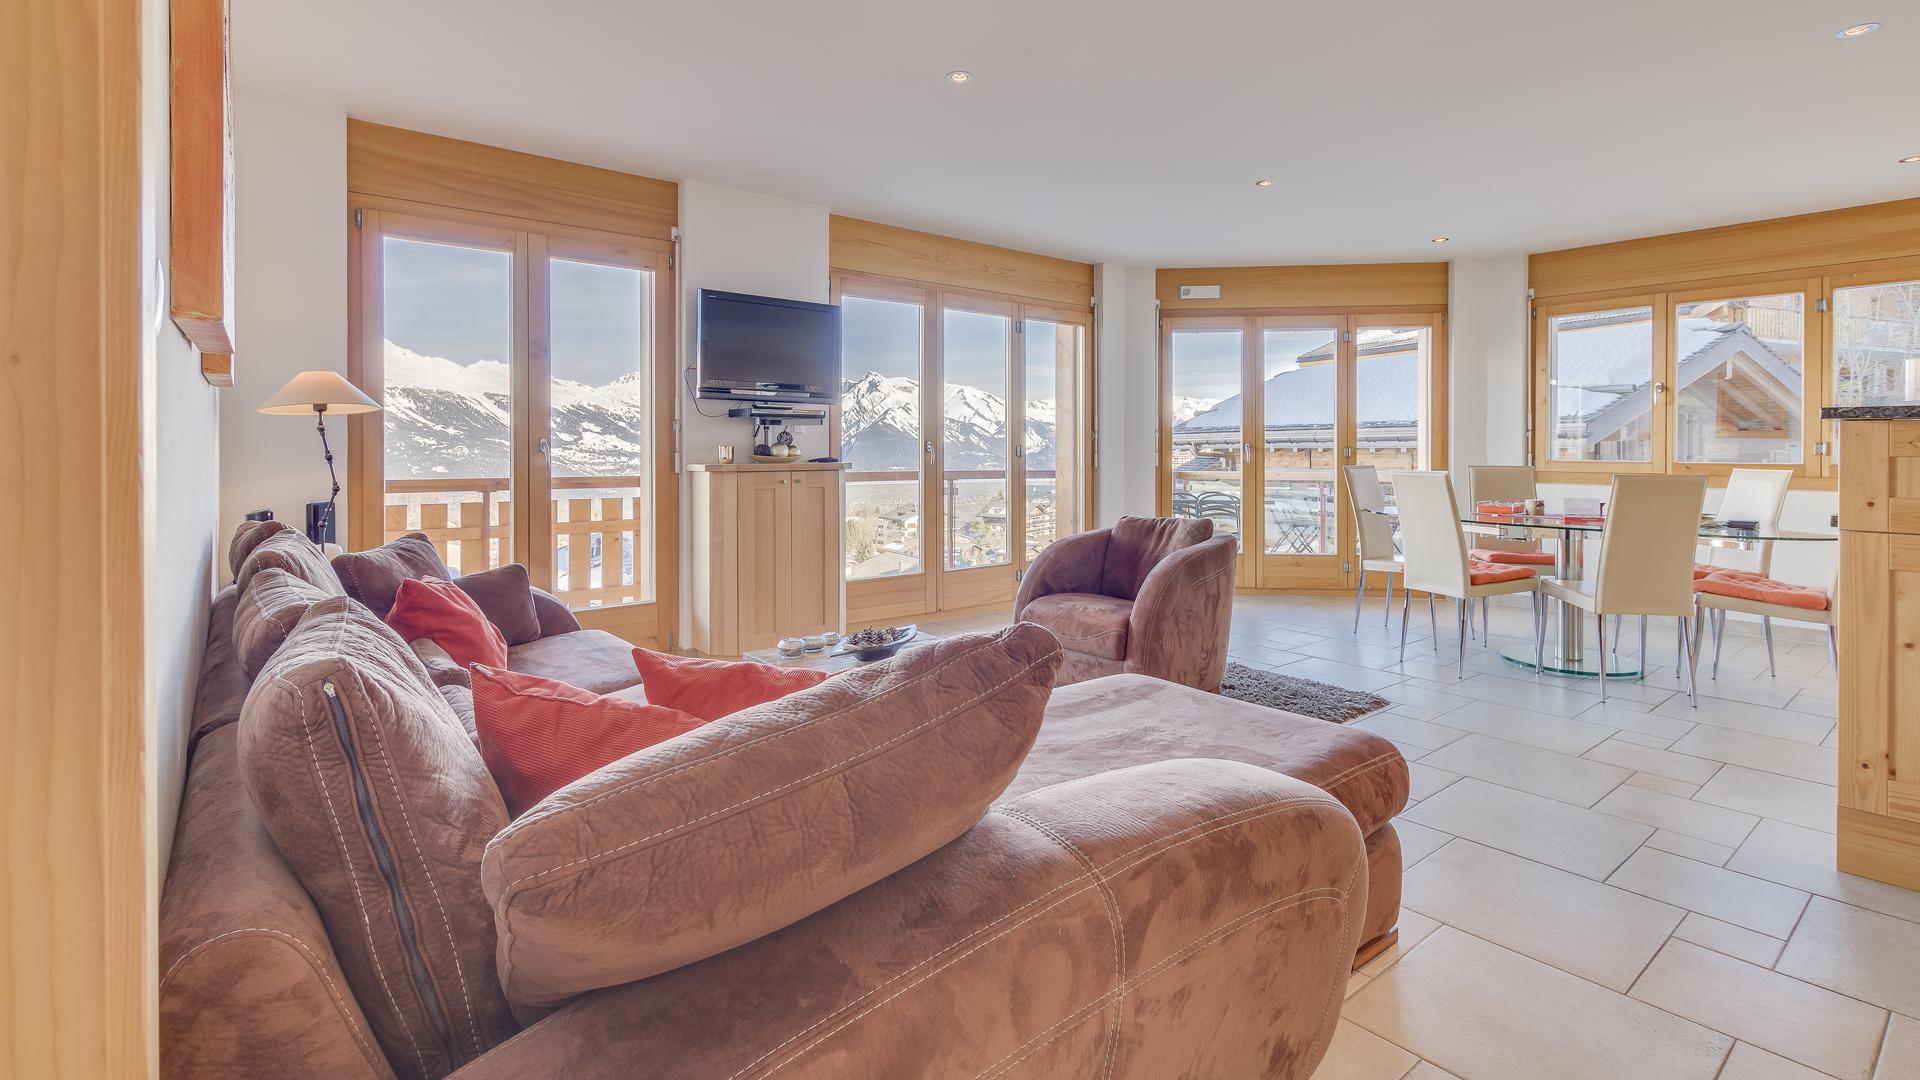 Le Tétras Lyre Apartments, Switzerland